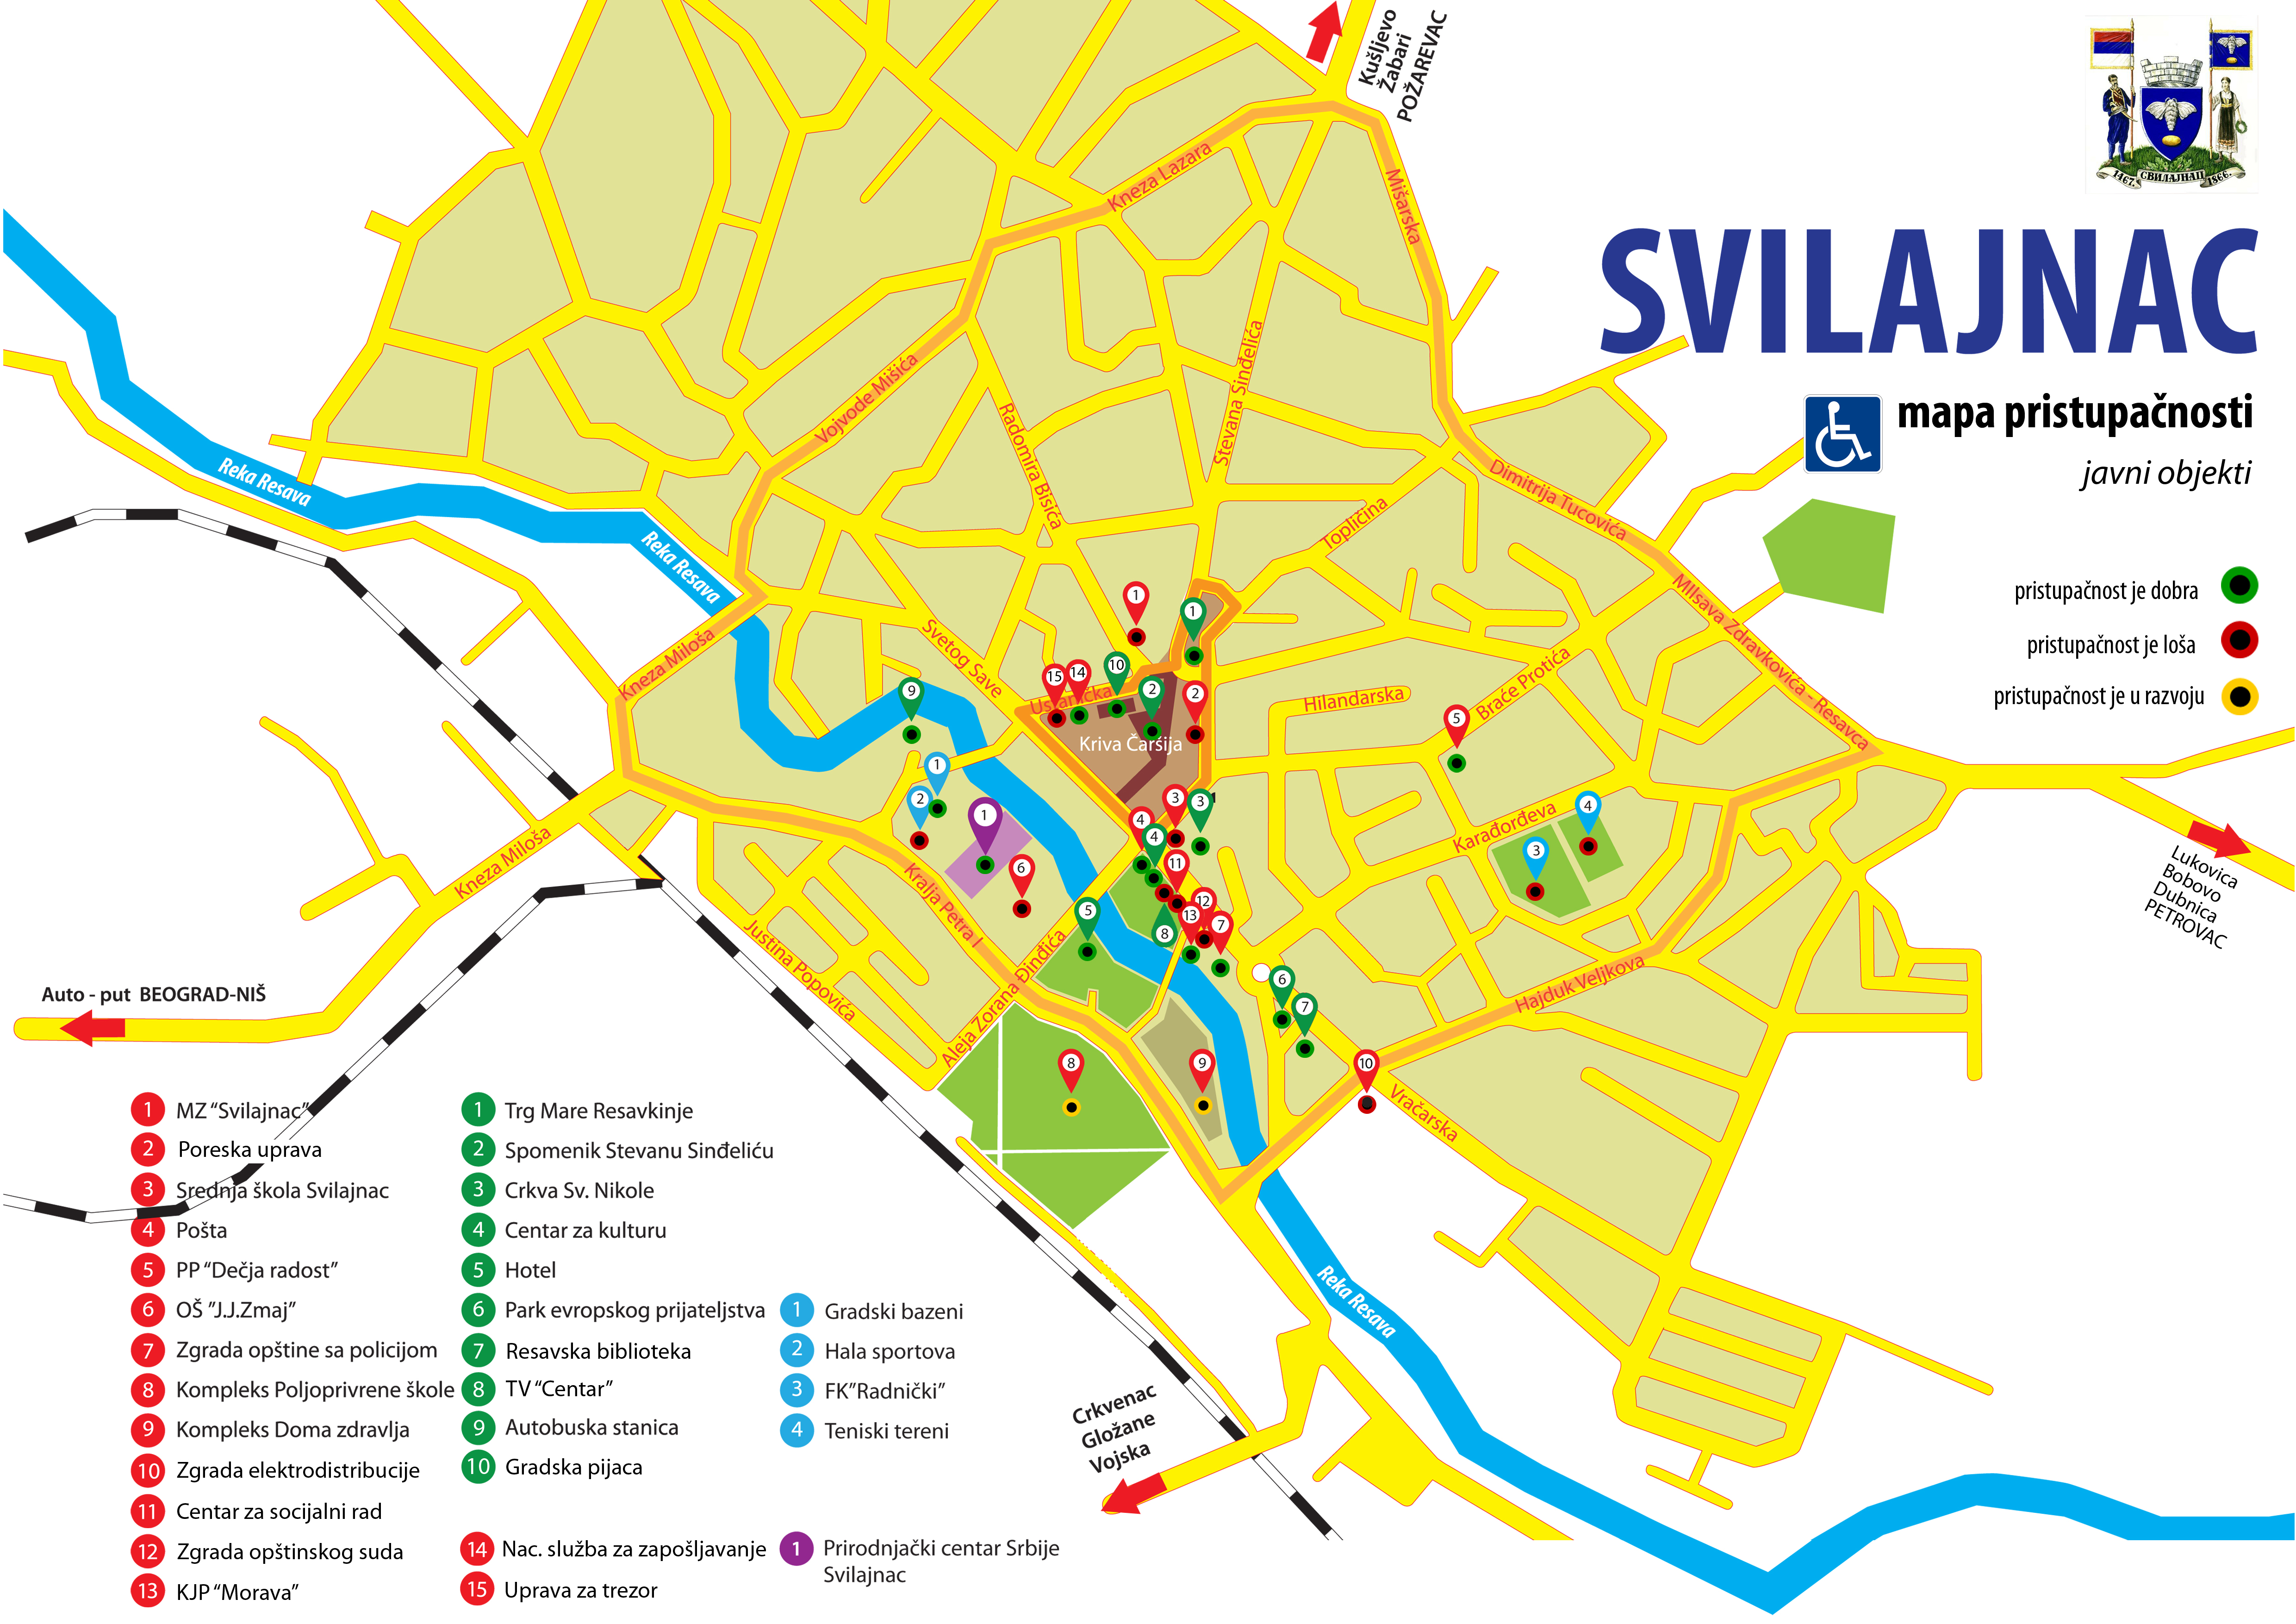 mapa srbije svilajnac Mape pristupačnosti za osobe sa invaliditetom | Opština Svilajnac mapa srbije svilajnac